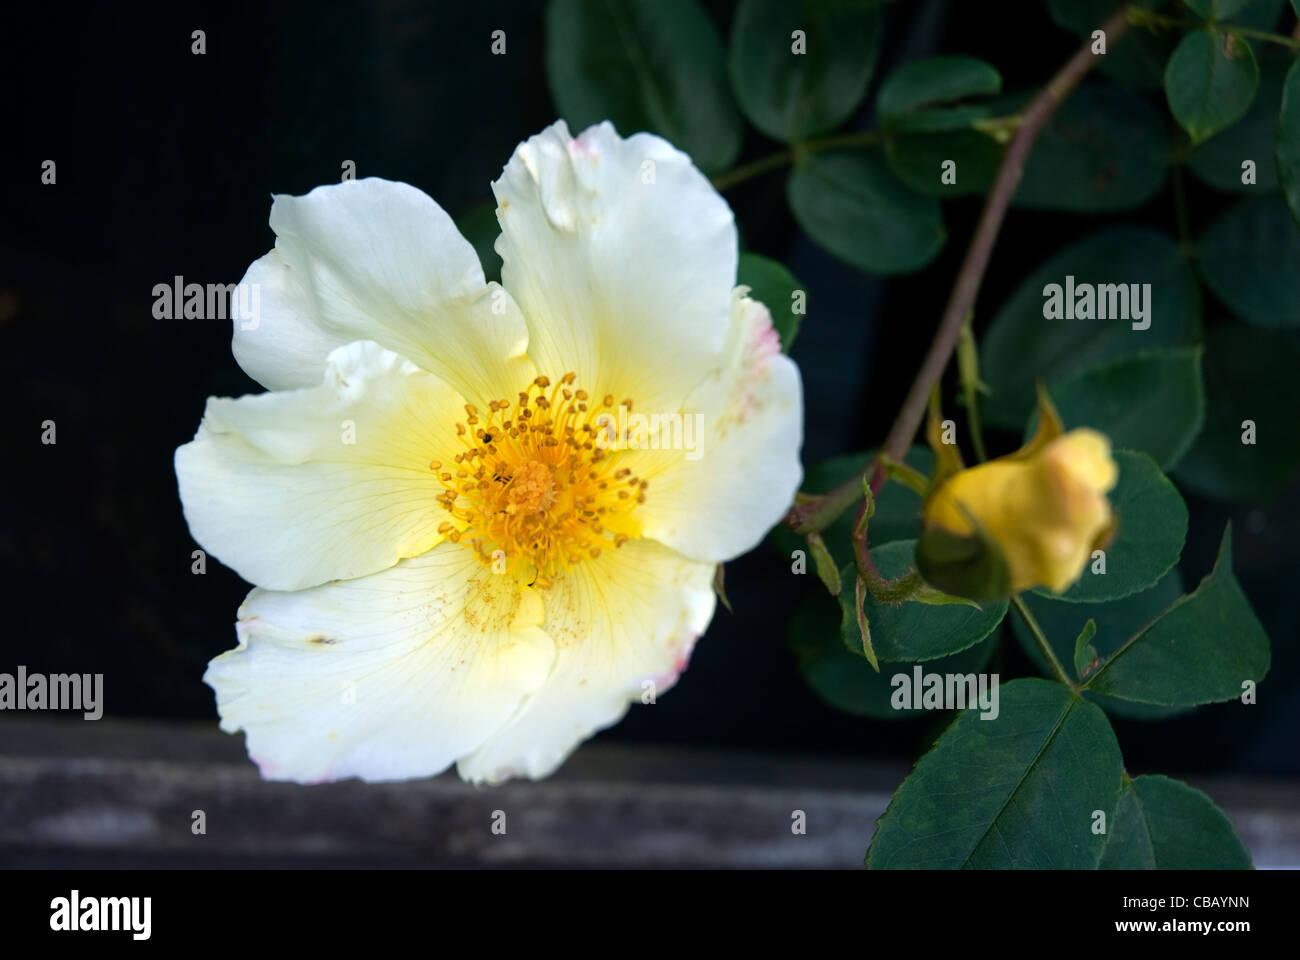 White flower with yellow centre shrub rose golden wings west white flower with yellow centre shrub rose golden wings west london england united kingdom mightylinksfo